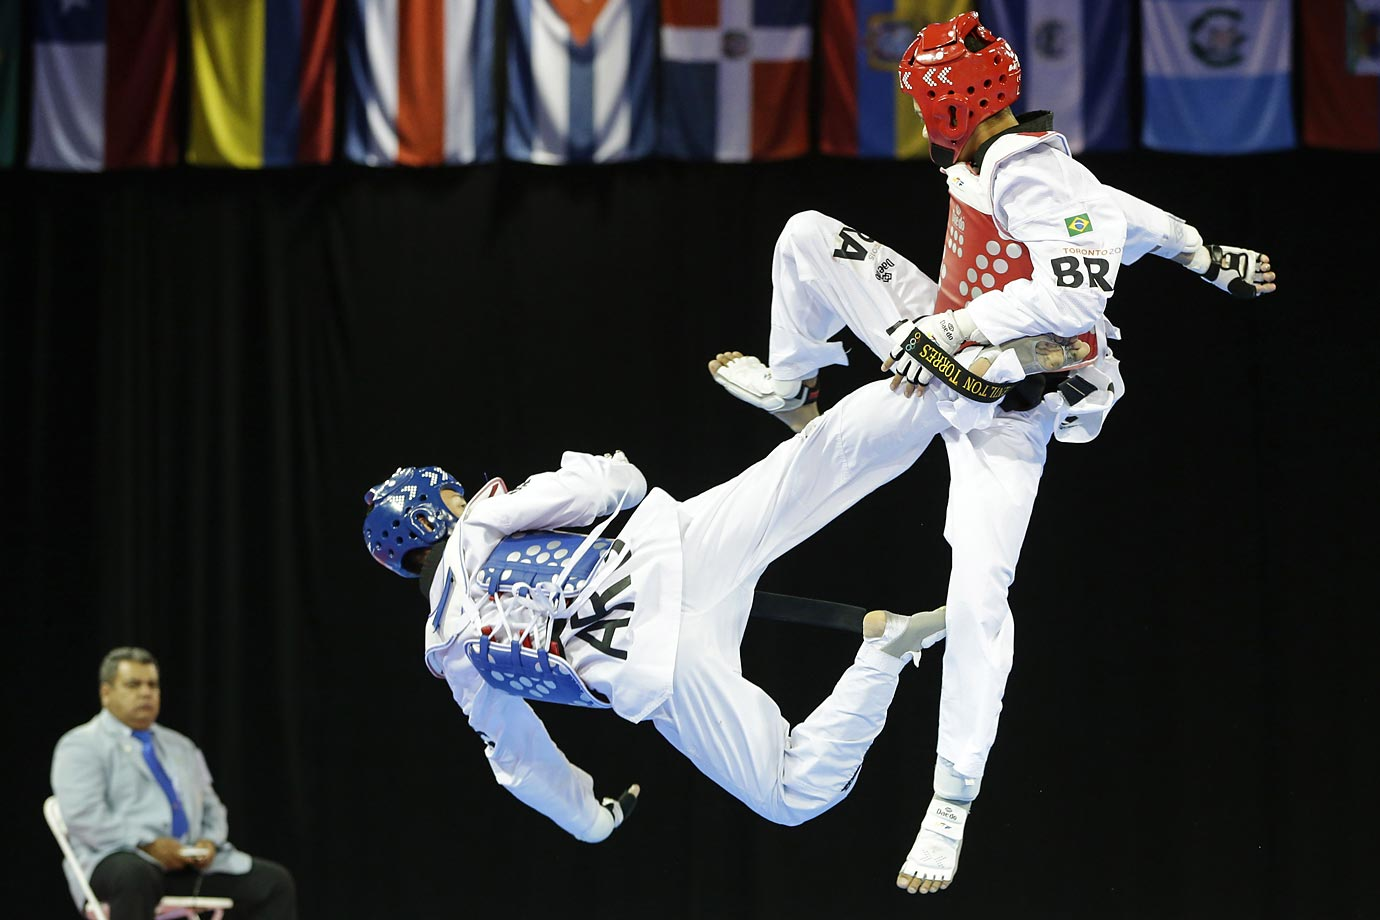 Argentina's Lucas Guzma fights Brazil's Venilton Torres during a 58kg bronze medal taekwondo match at the Pan Am Games. Guzman won.